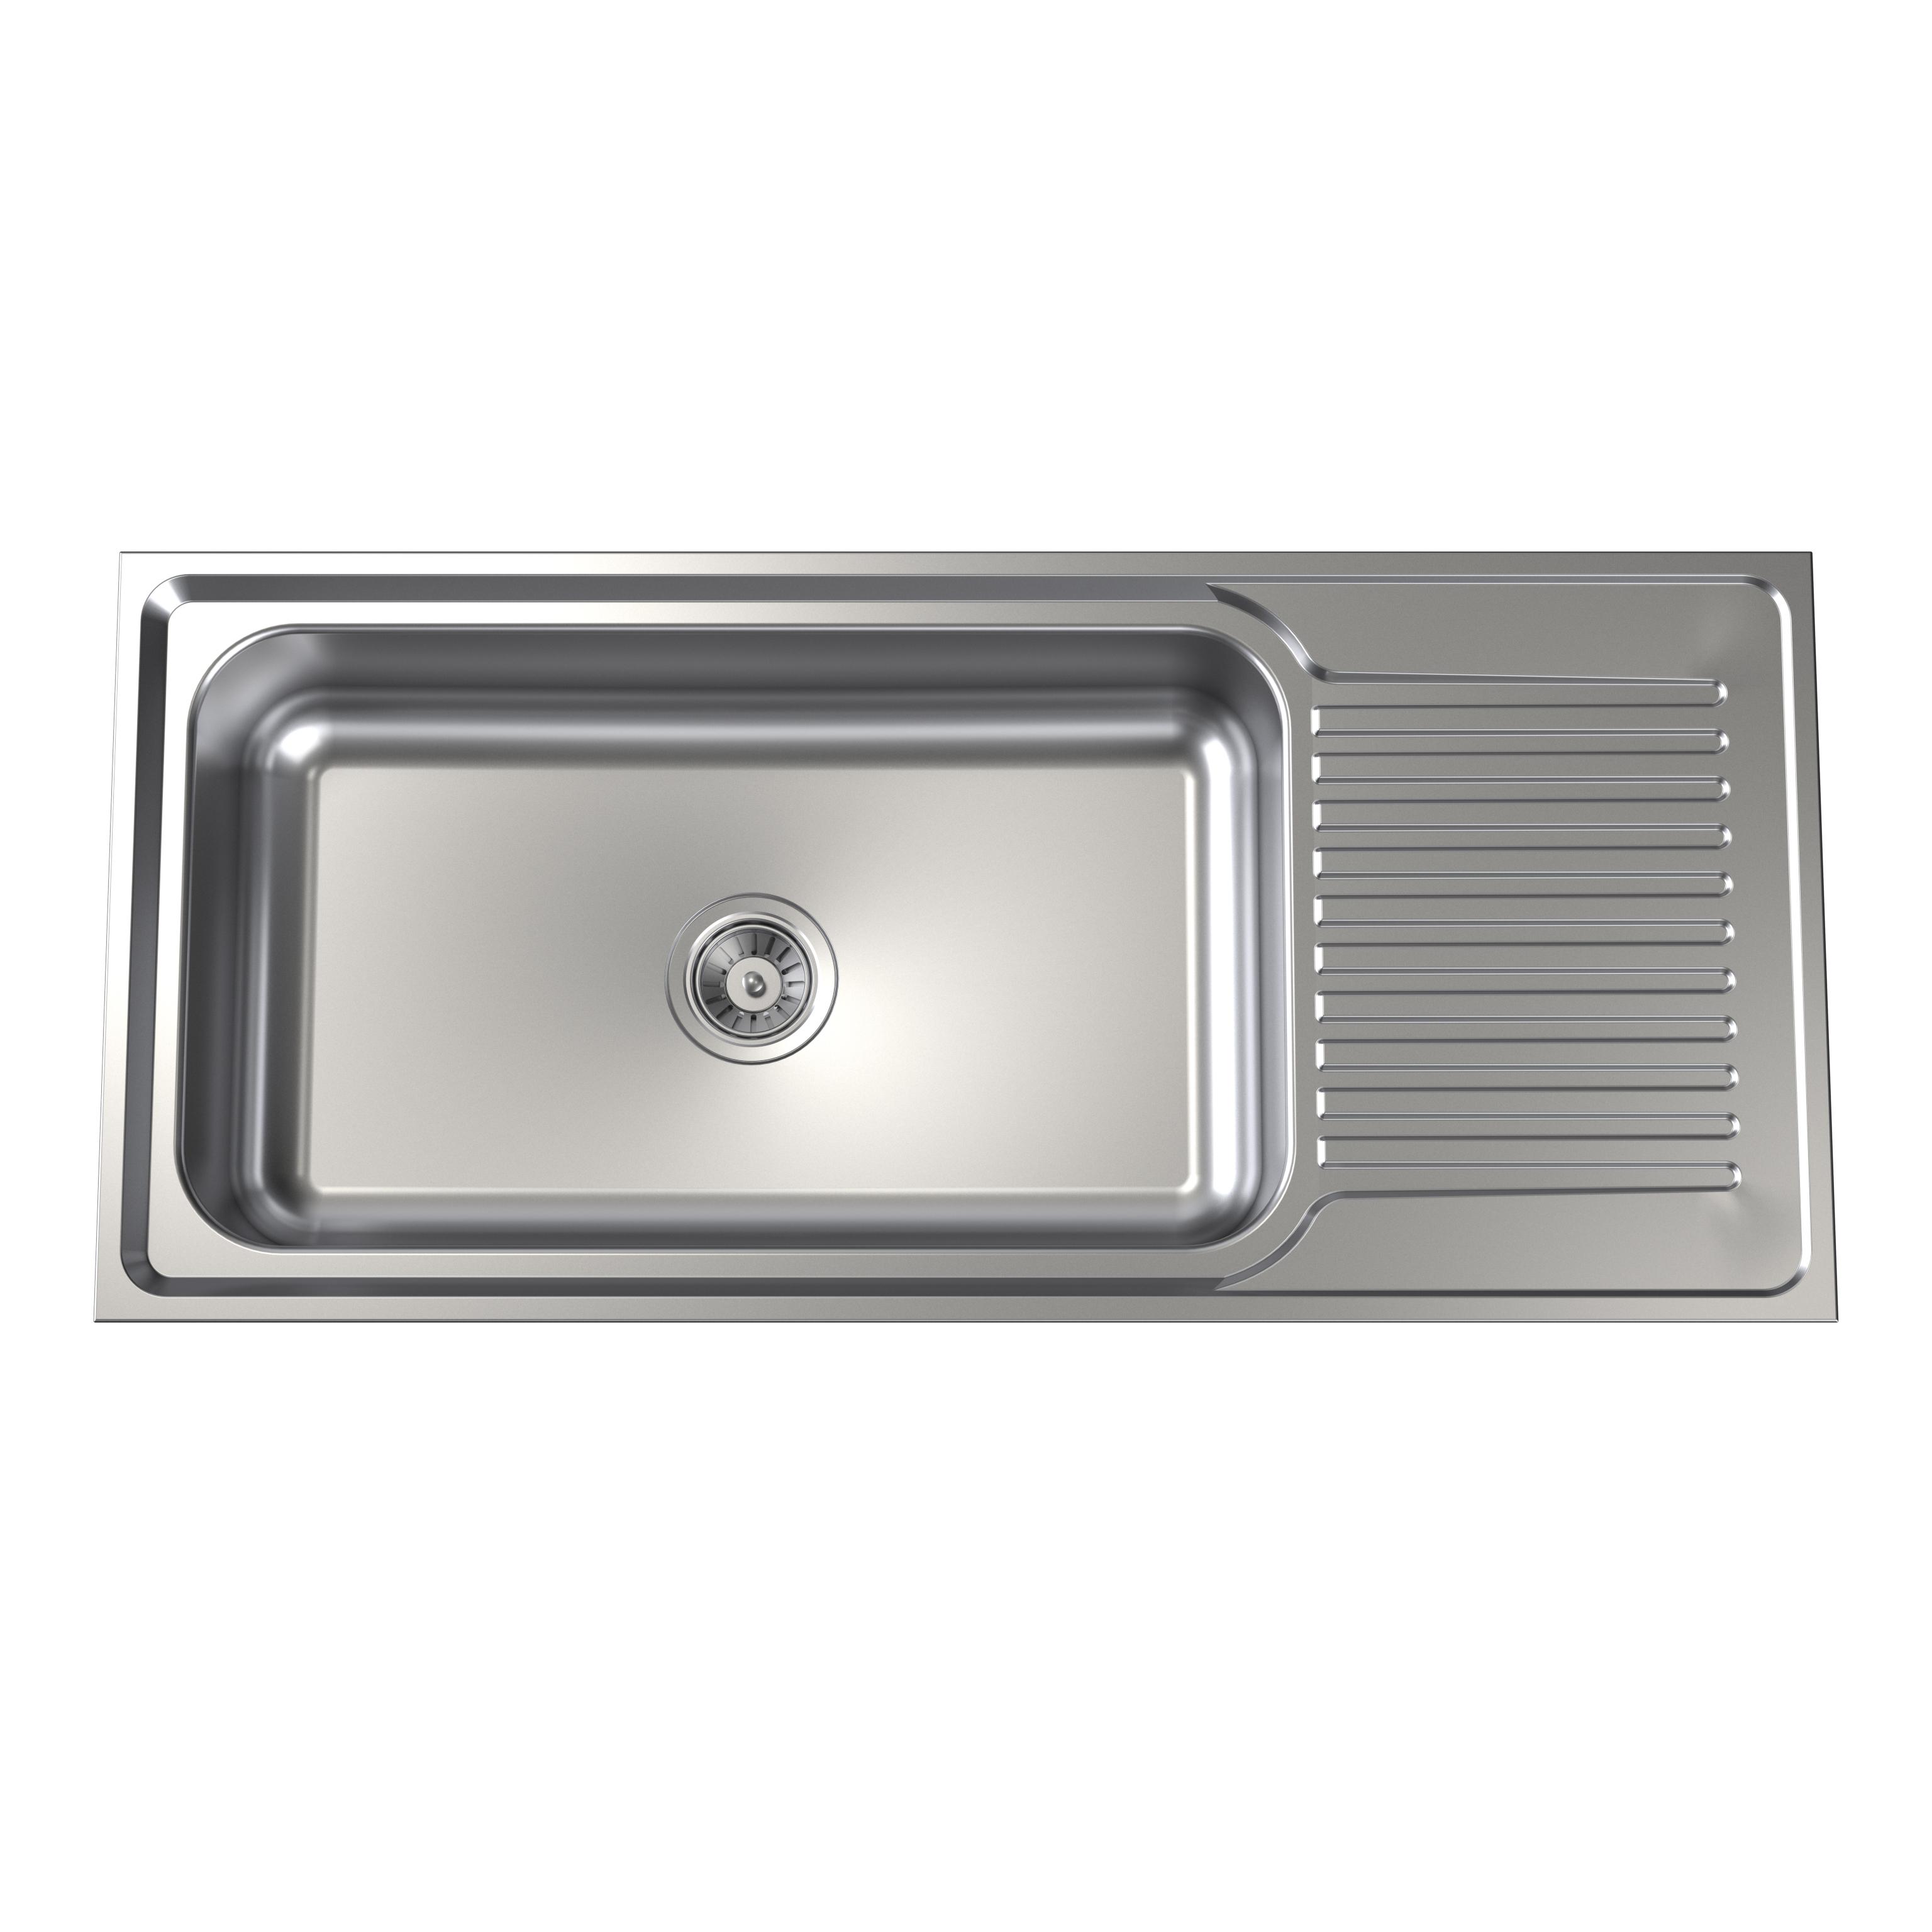 Punch Mega Bowl Sink No Tap Hole Clark